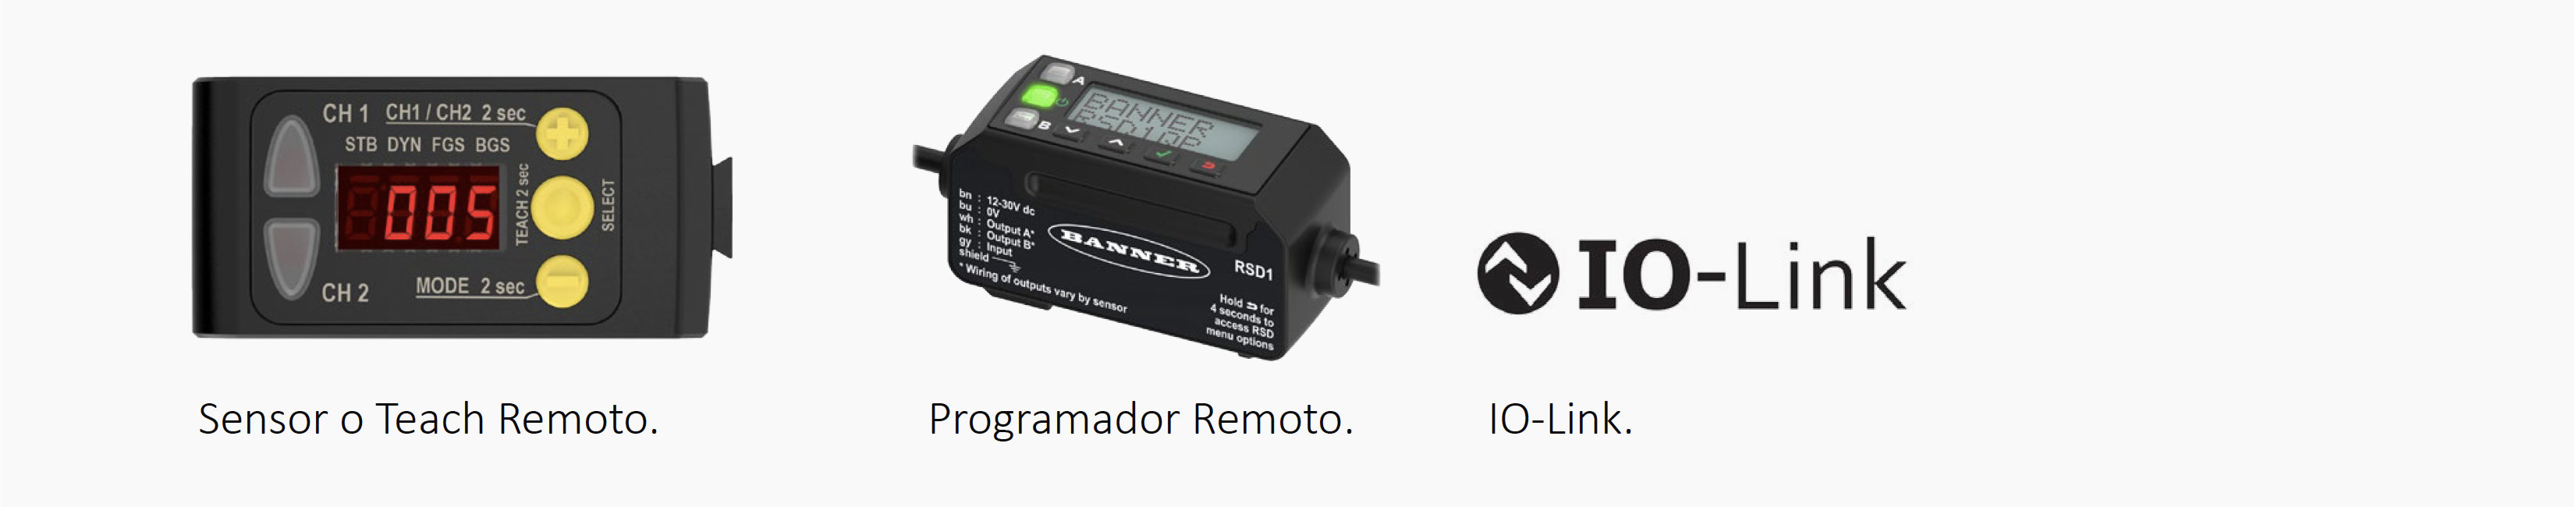 sensor/programador remoto - IO-LInk